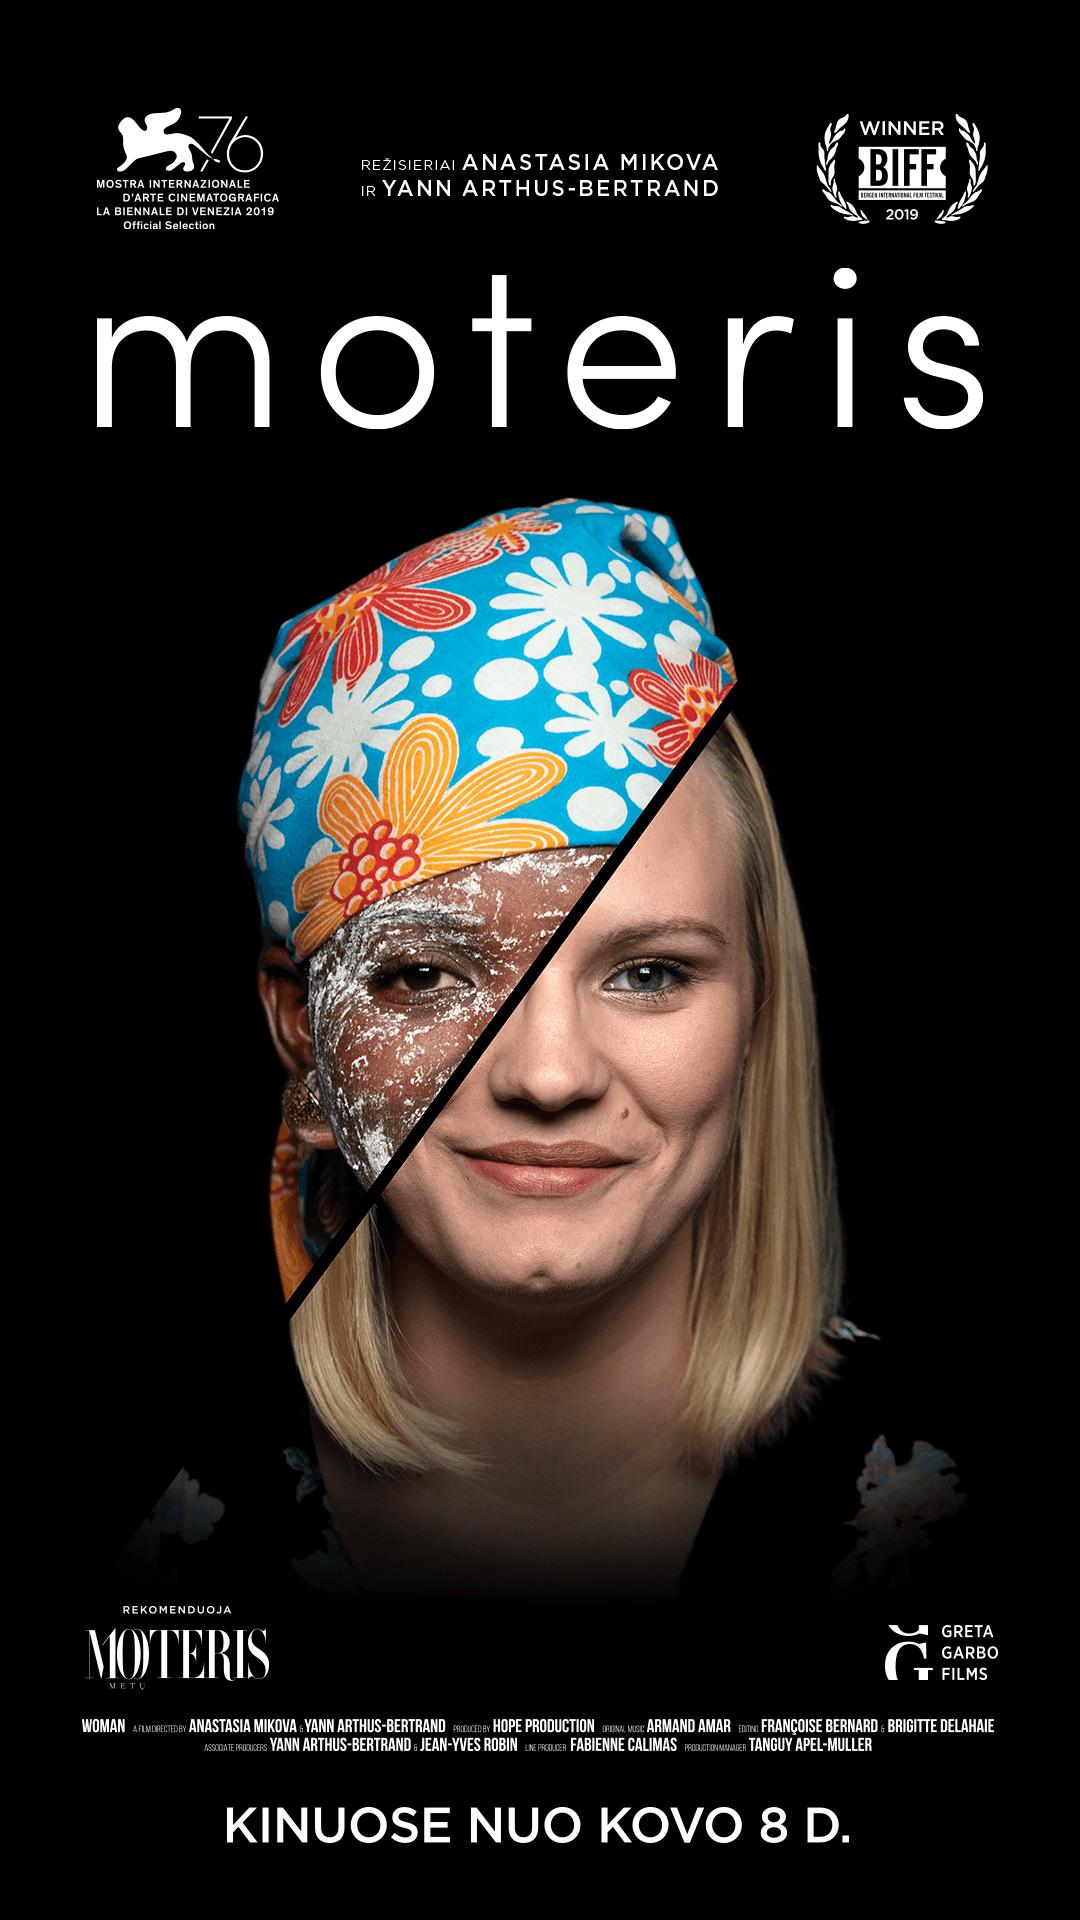 MOTERIS (Woman)